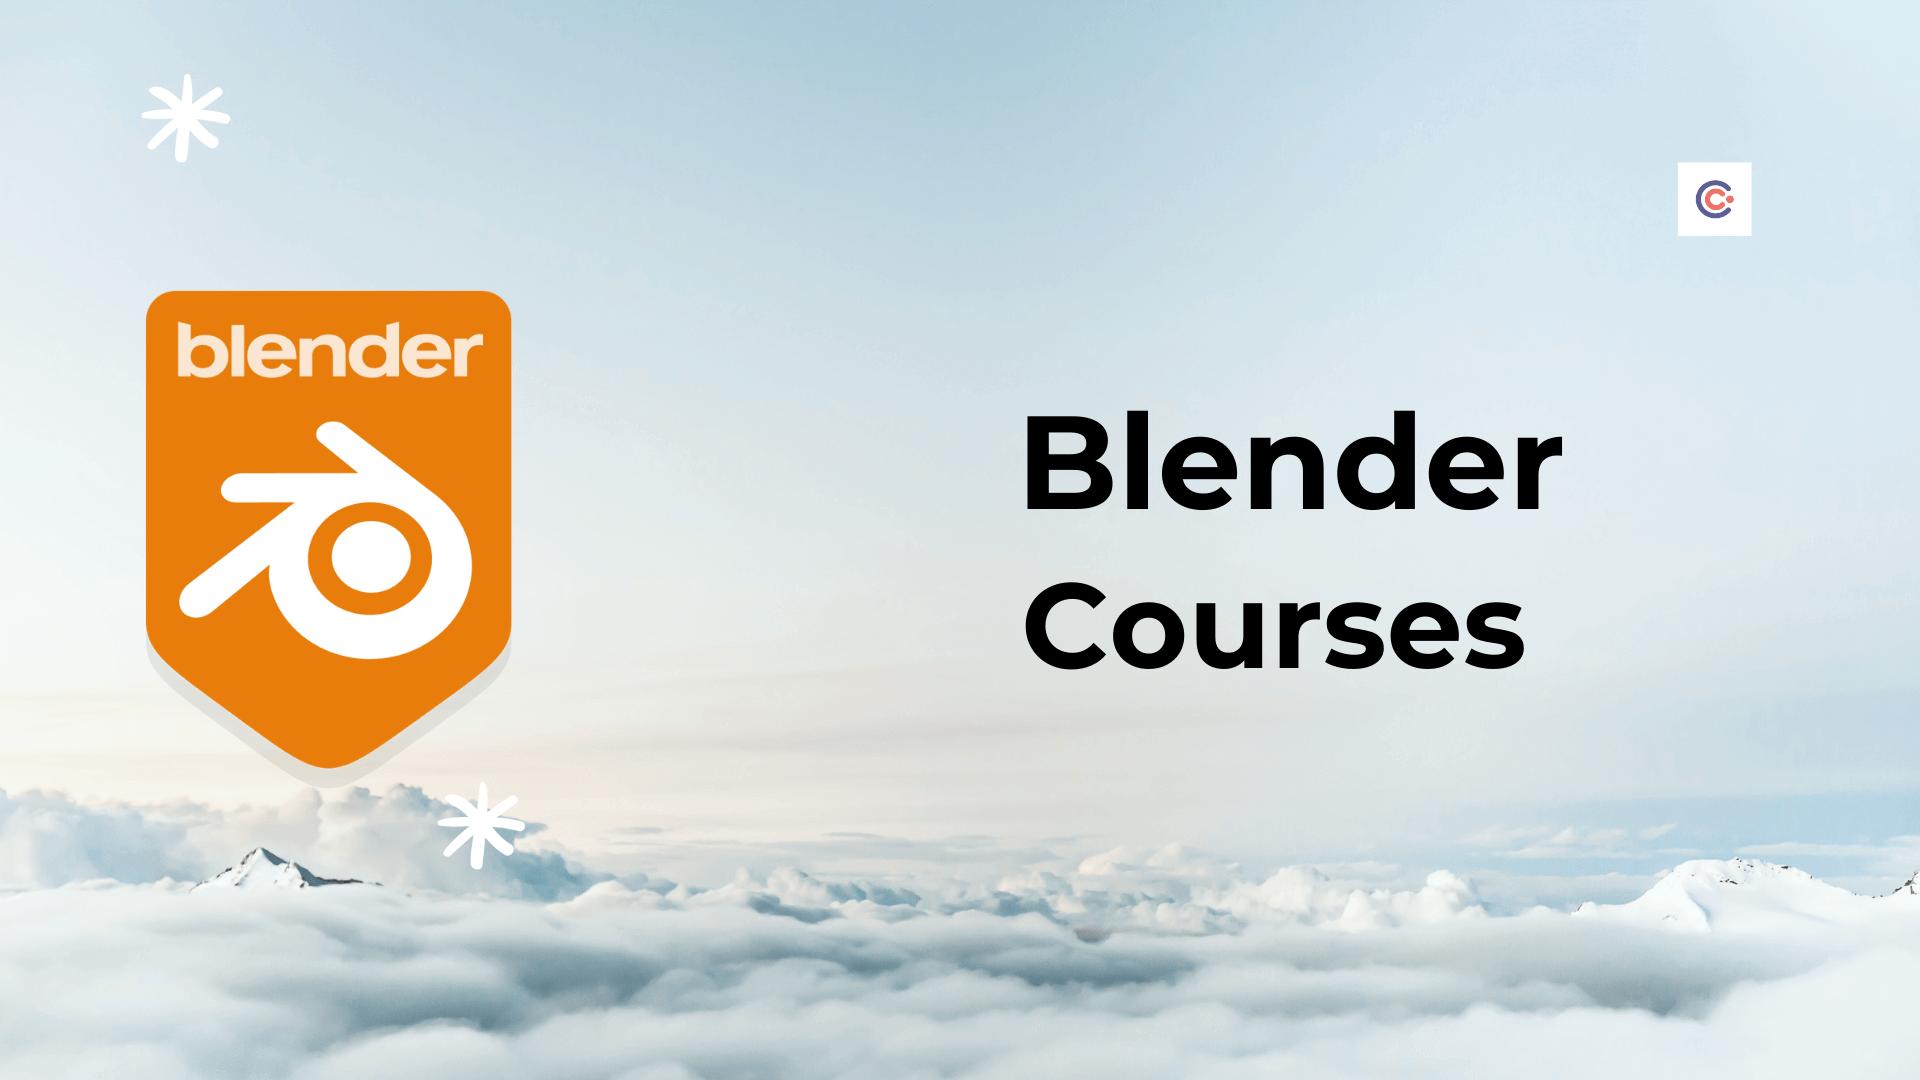 10 Best Blender 3D Tutorials & Courses - Learn Blender 3D Online